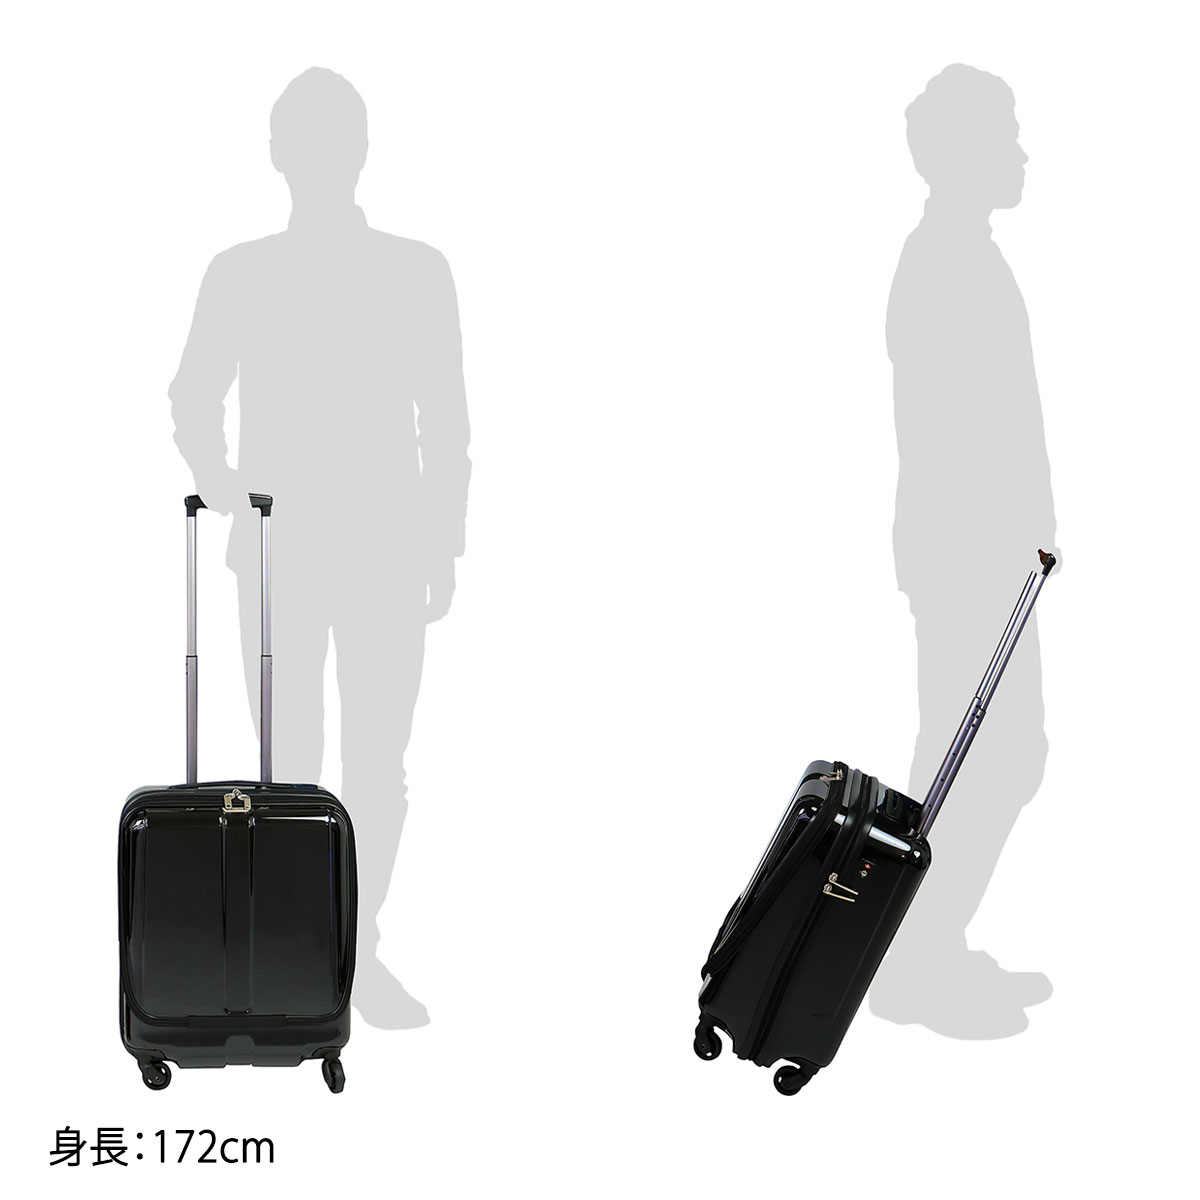 World Traveler suitcase 38L 05810